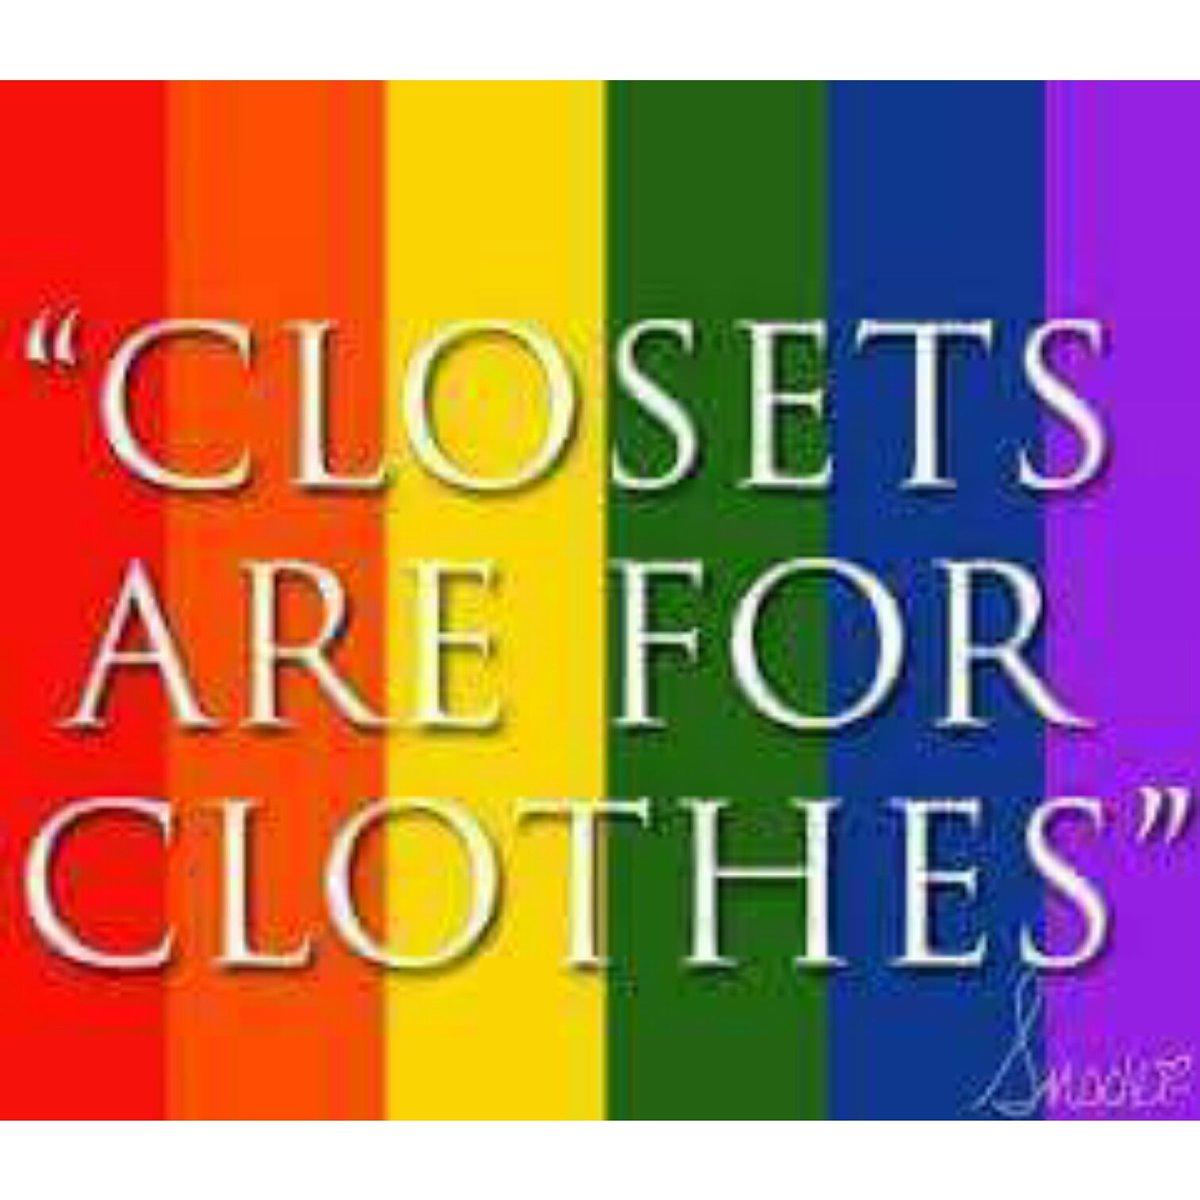 are closets our clothes for closet